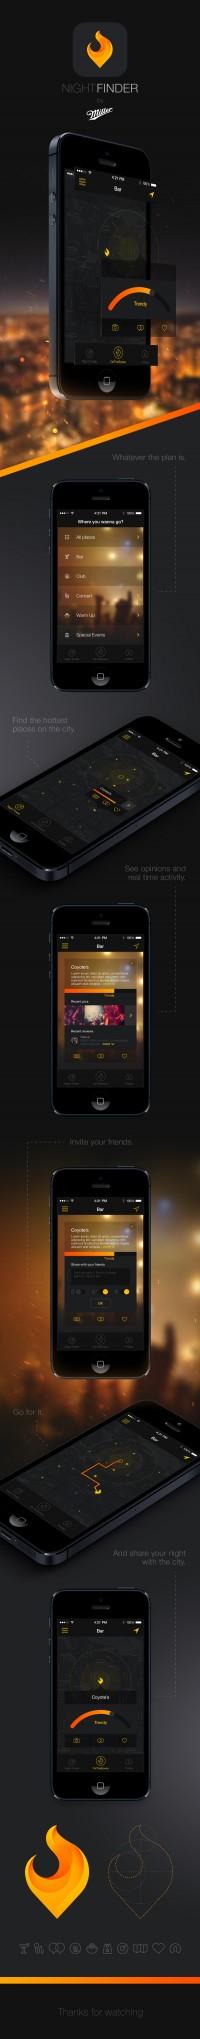 Night Finder App on